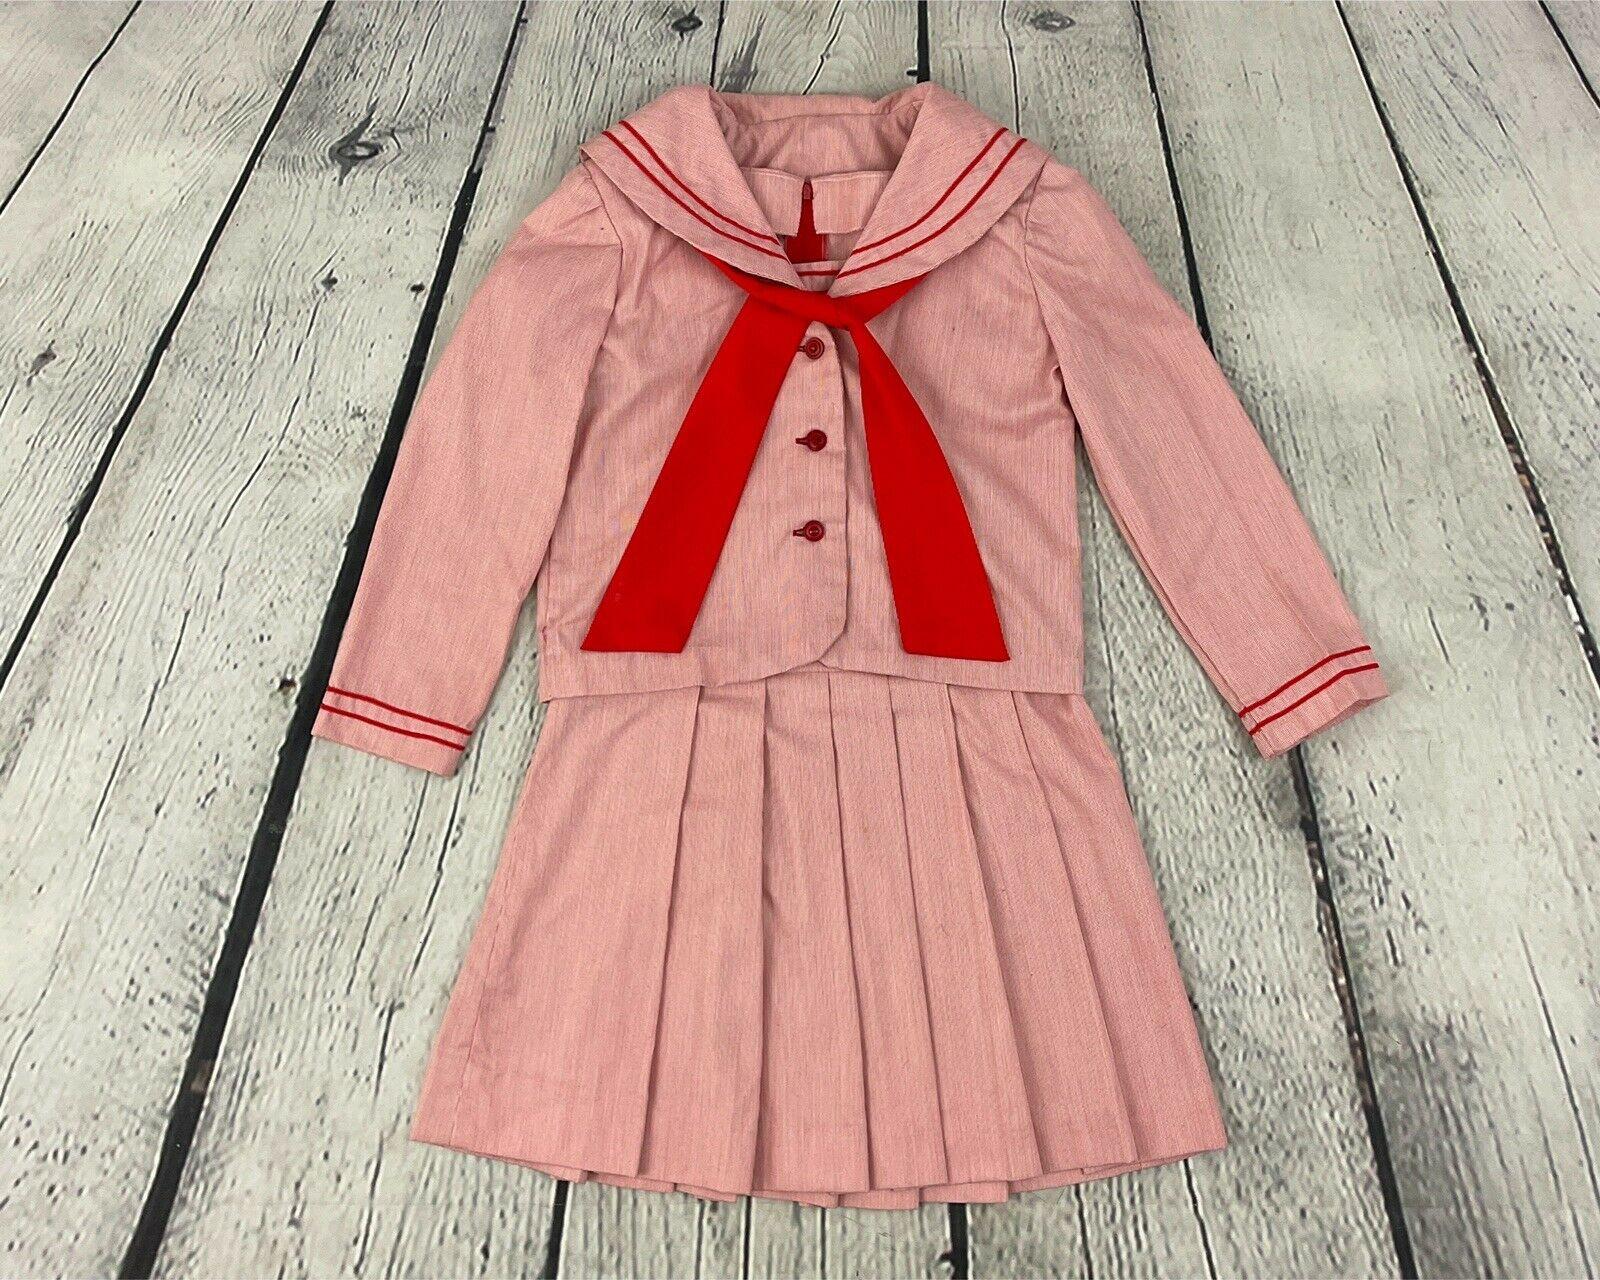 Vintage Scarf Styles -1920s to 1960s 1960S Vintage Girls Red Pinstriped Dress  Jacket with Scarf Suit Set Madeline School Uniform Sz 9 - 10 $0.00 AT vintagedancer.com